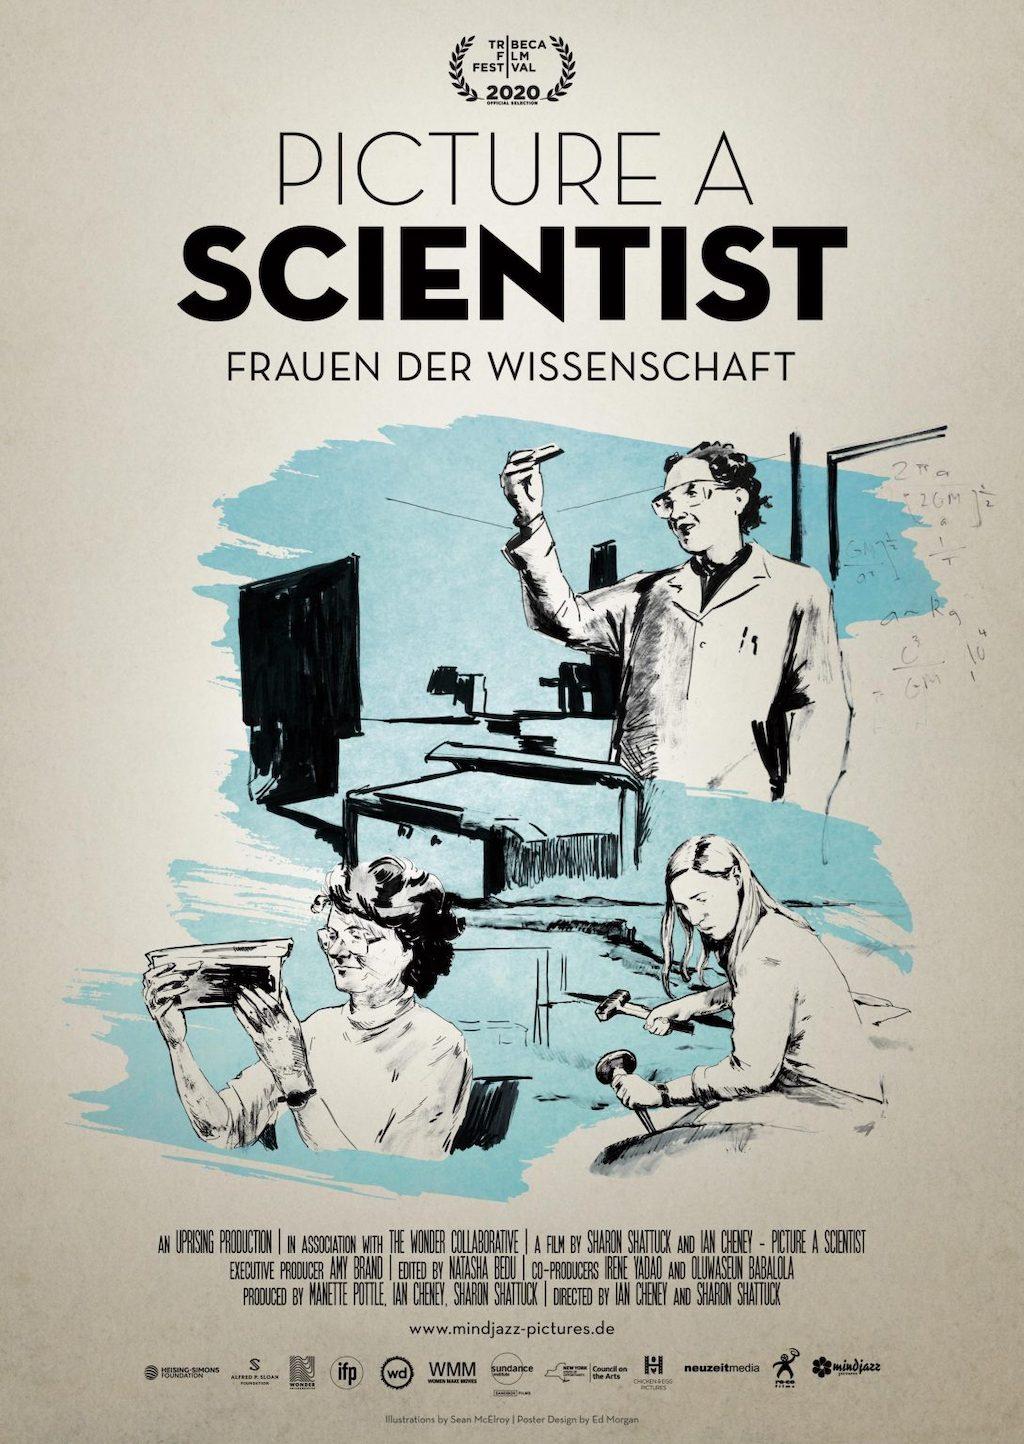 Picture a scientist